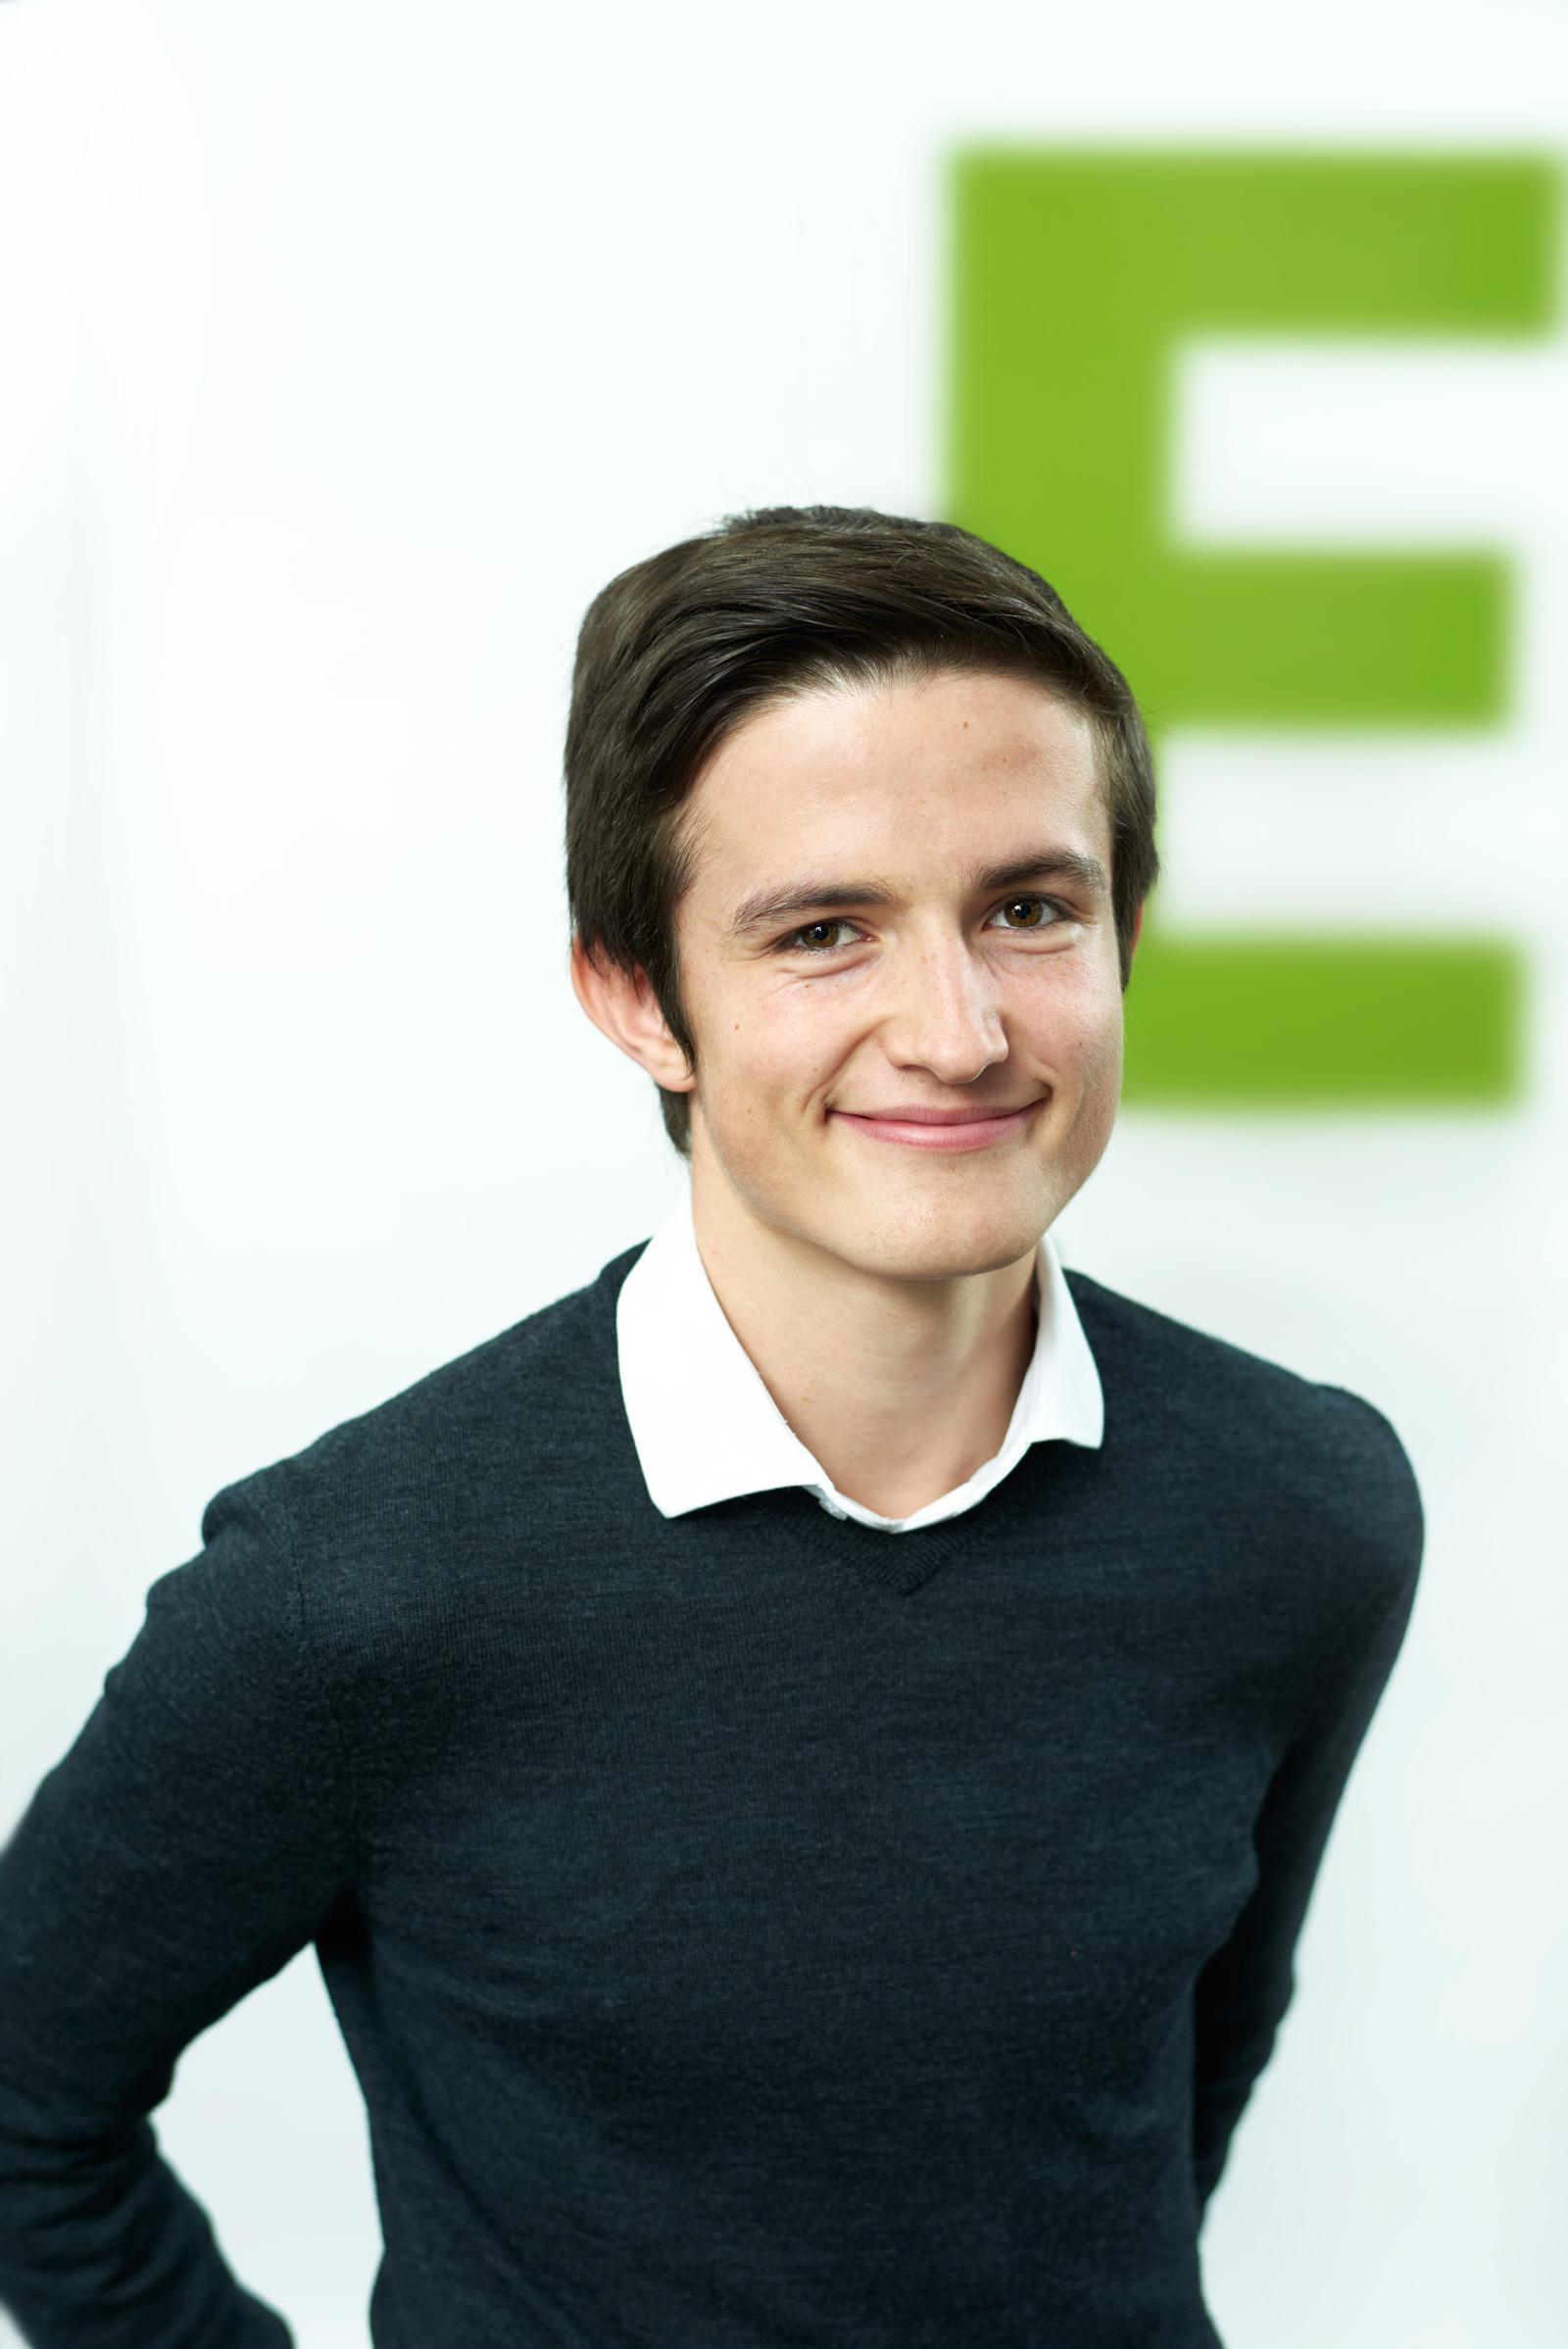 Benjamin Walder, 22, Gemeinderat